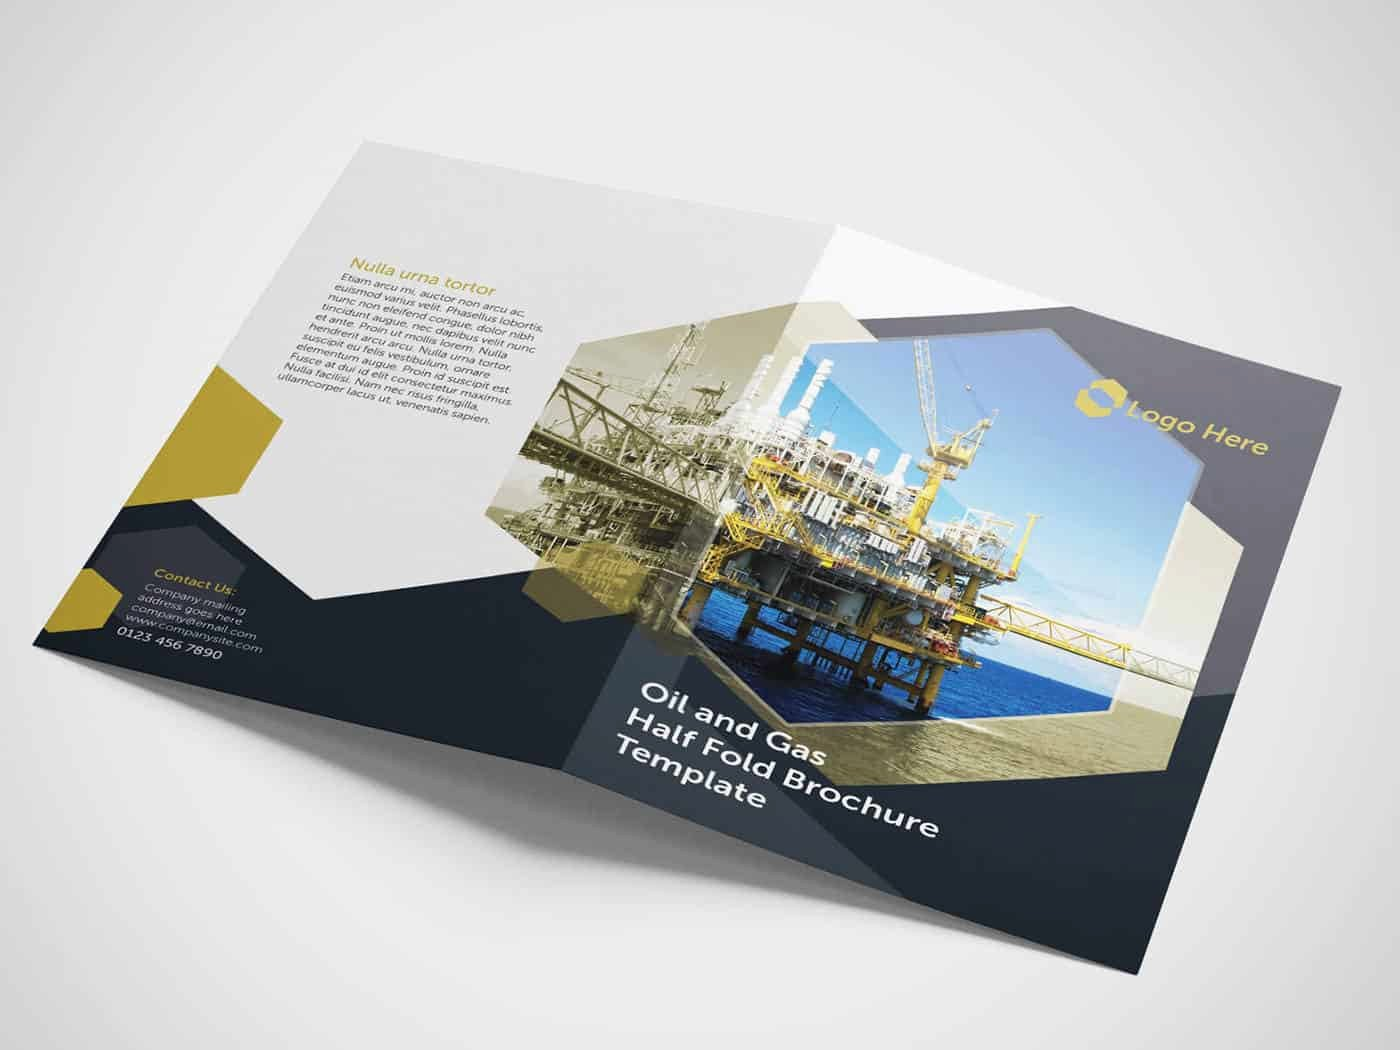 Half Fold Brochure Template Free Best Of Half Fold Oil and Gas Brochure Template On Vectogravic Design